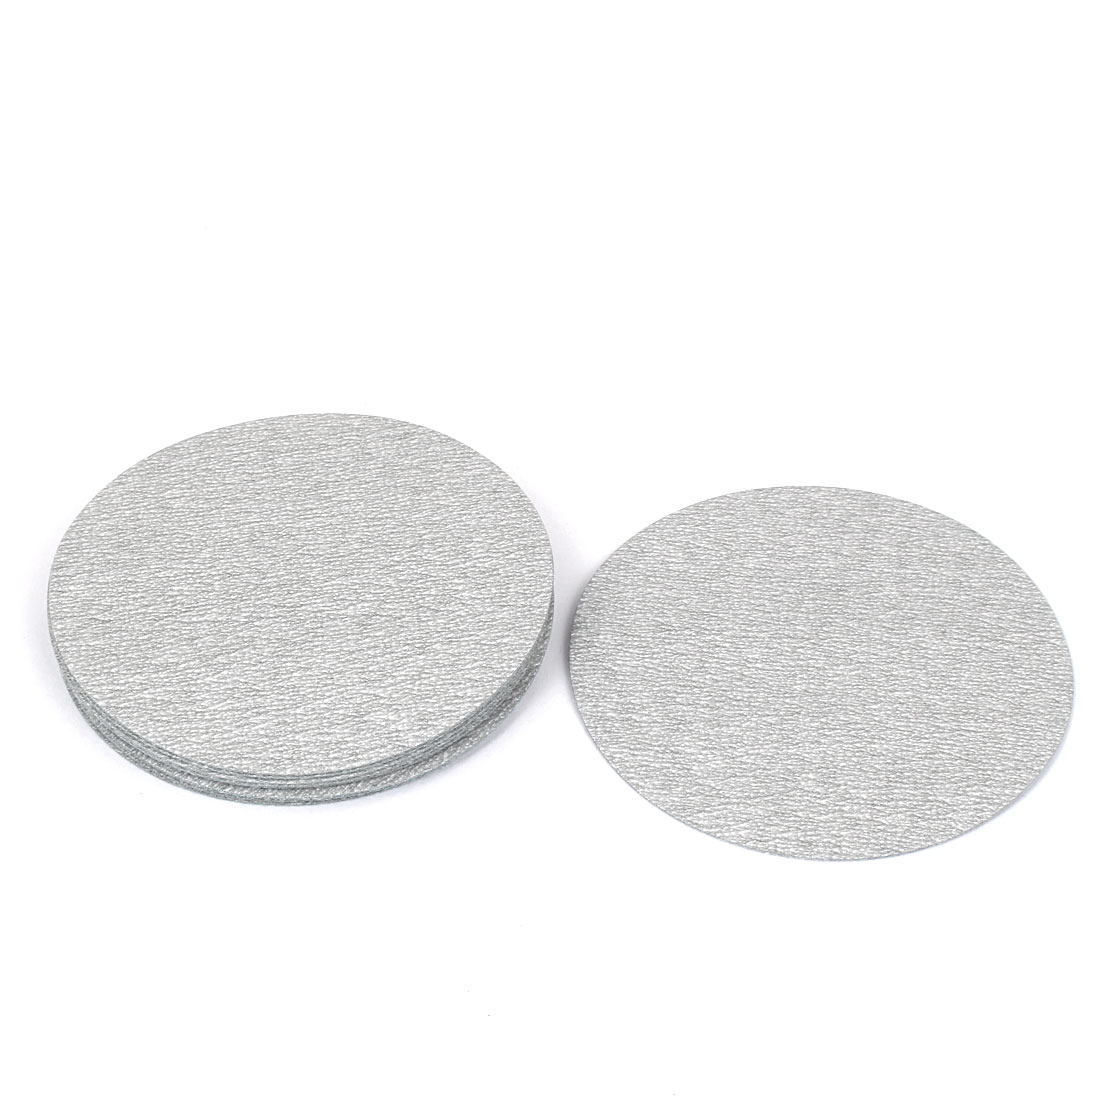 "4"" Dia Polishing Round Dry Abrasive Sanding Sandpaper Sheet Disc 600 Grit 10pcs"